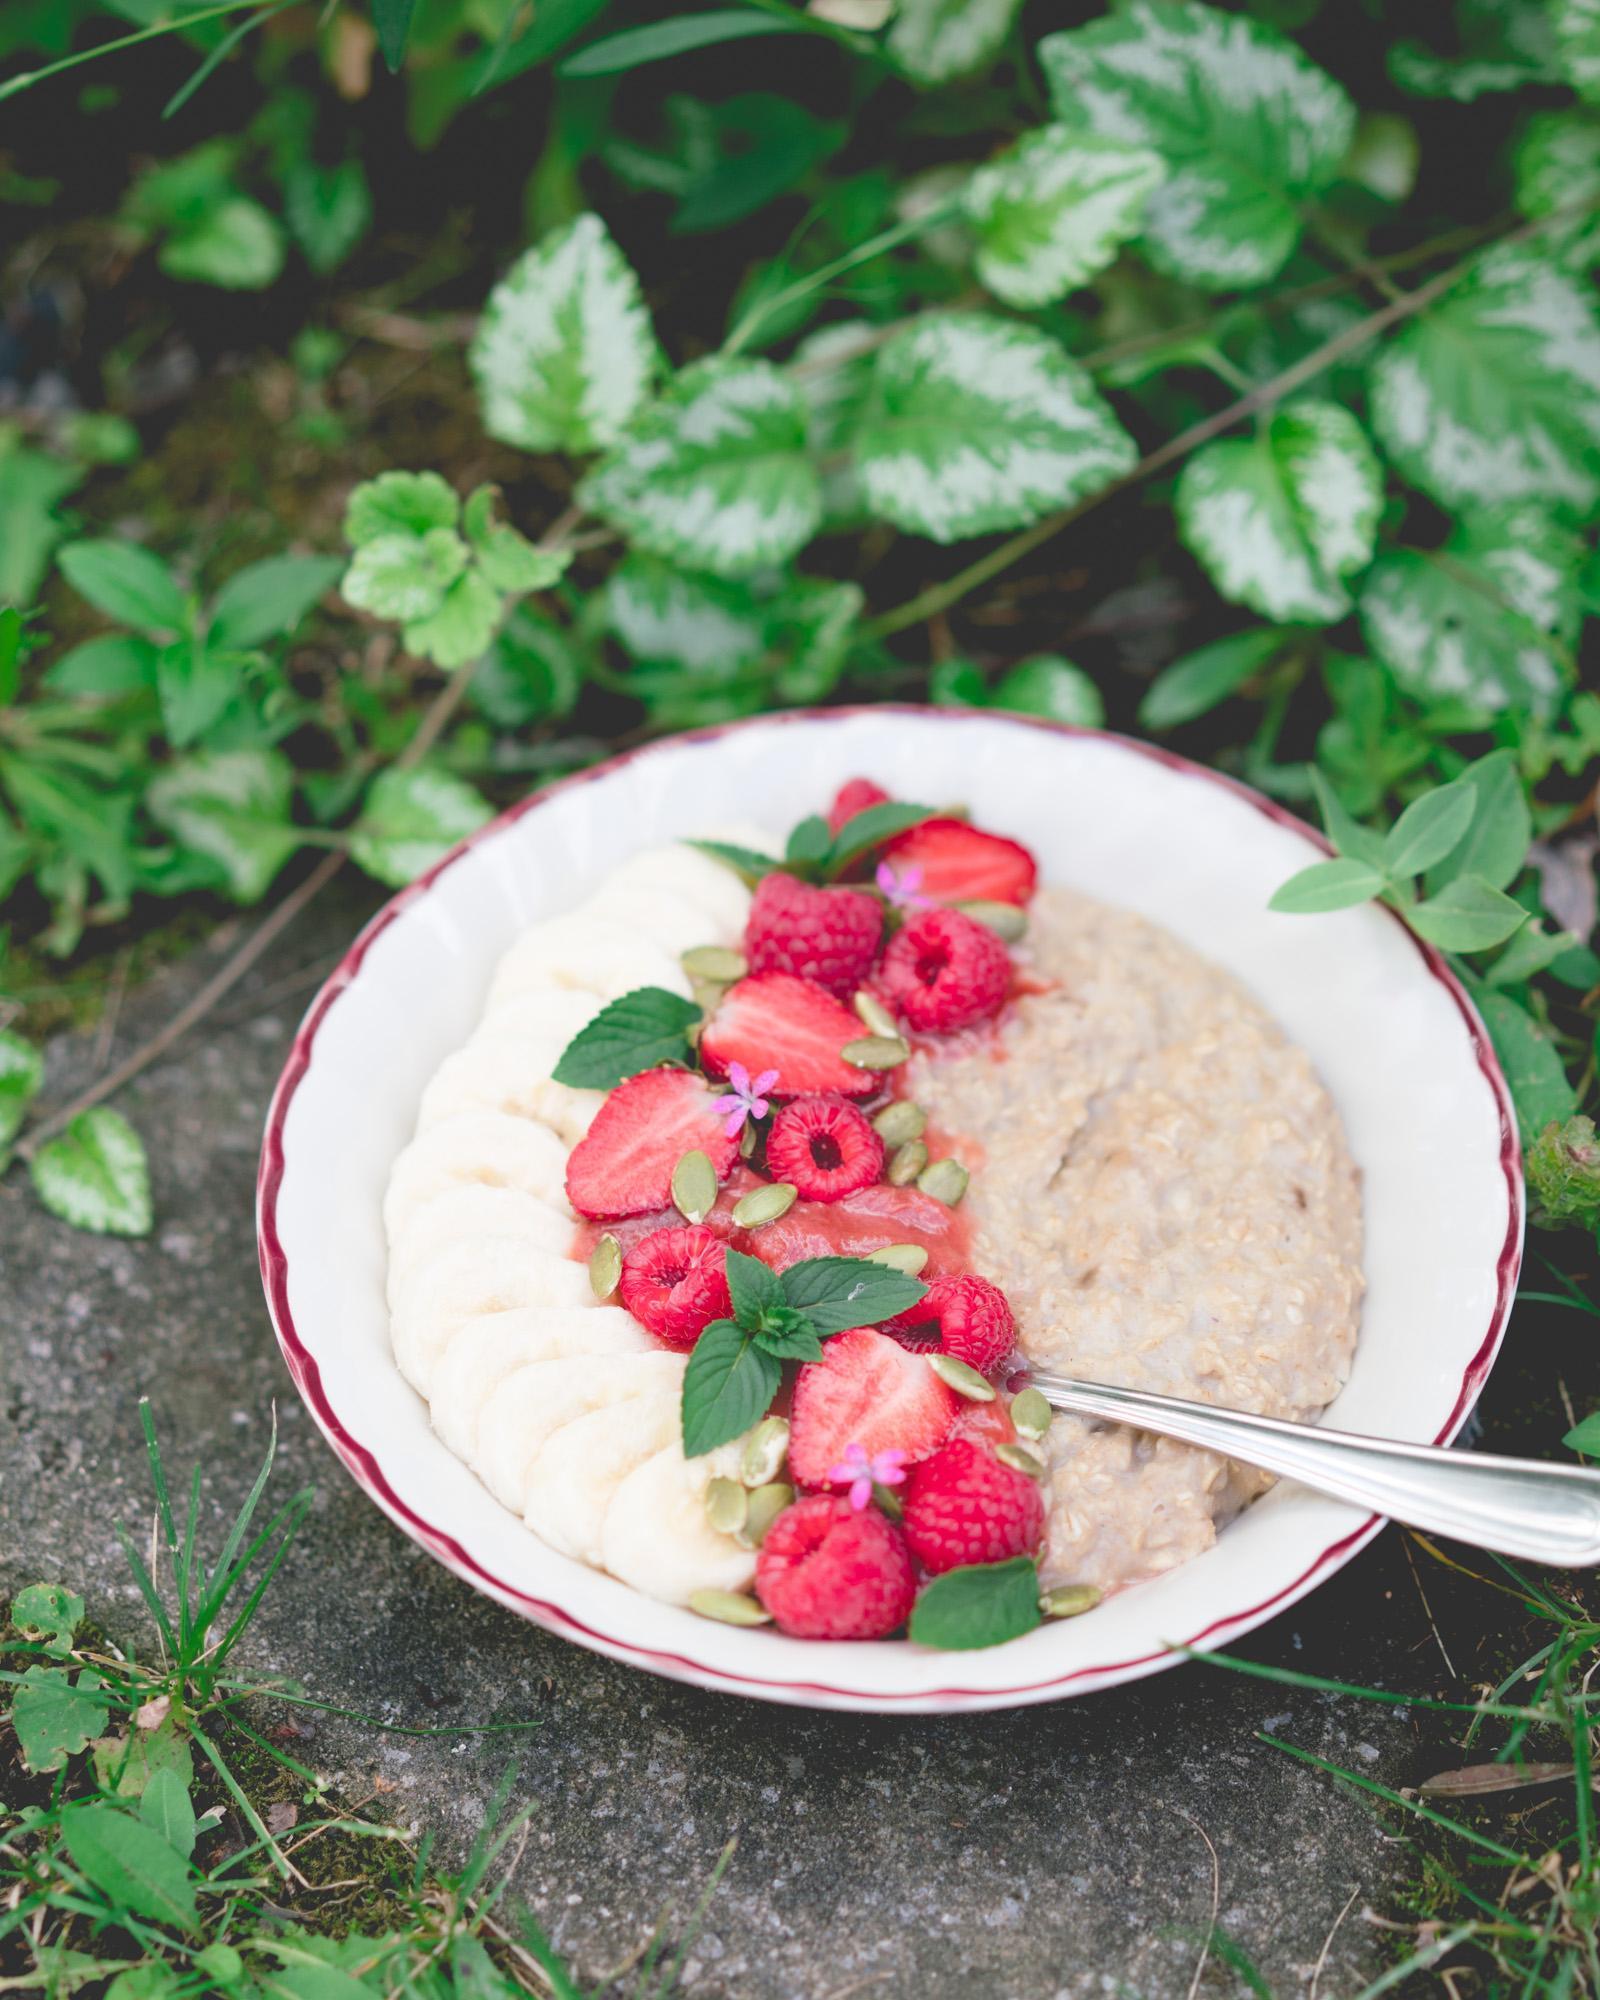 Classic Porridge - surgar free, makes 2 servings